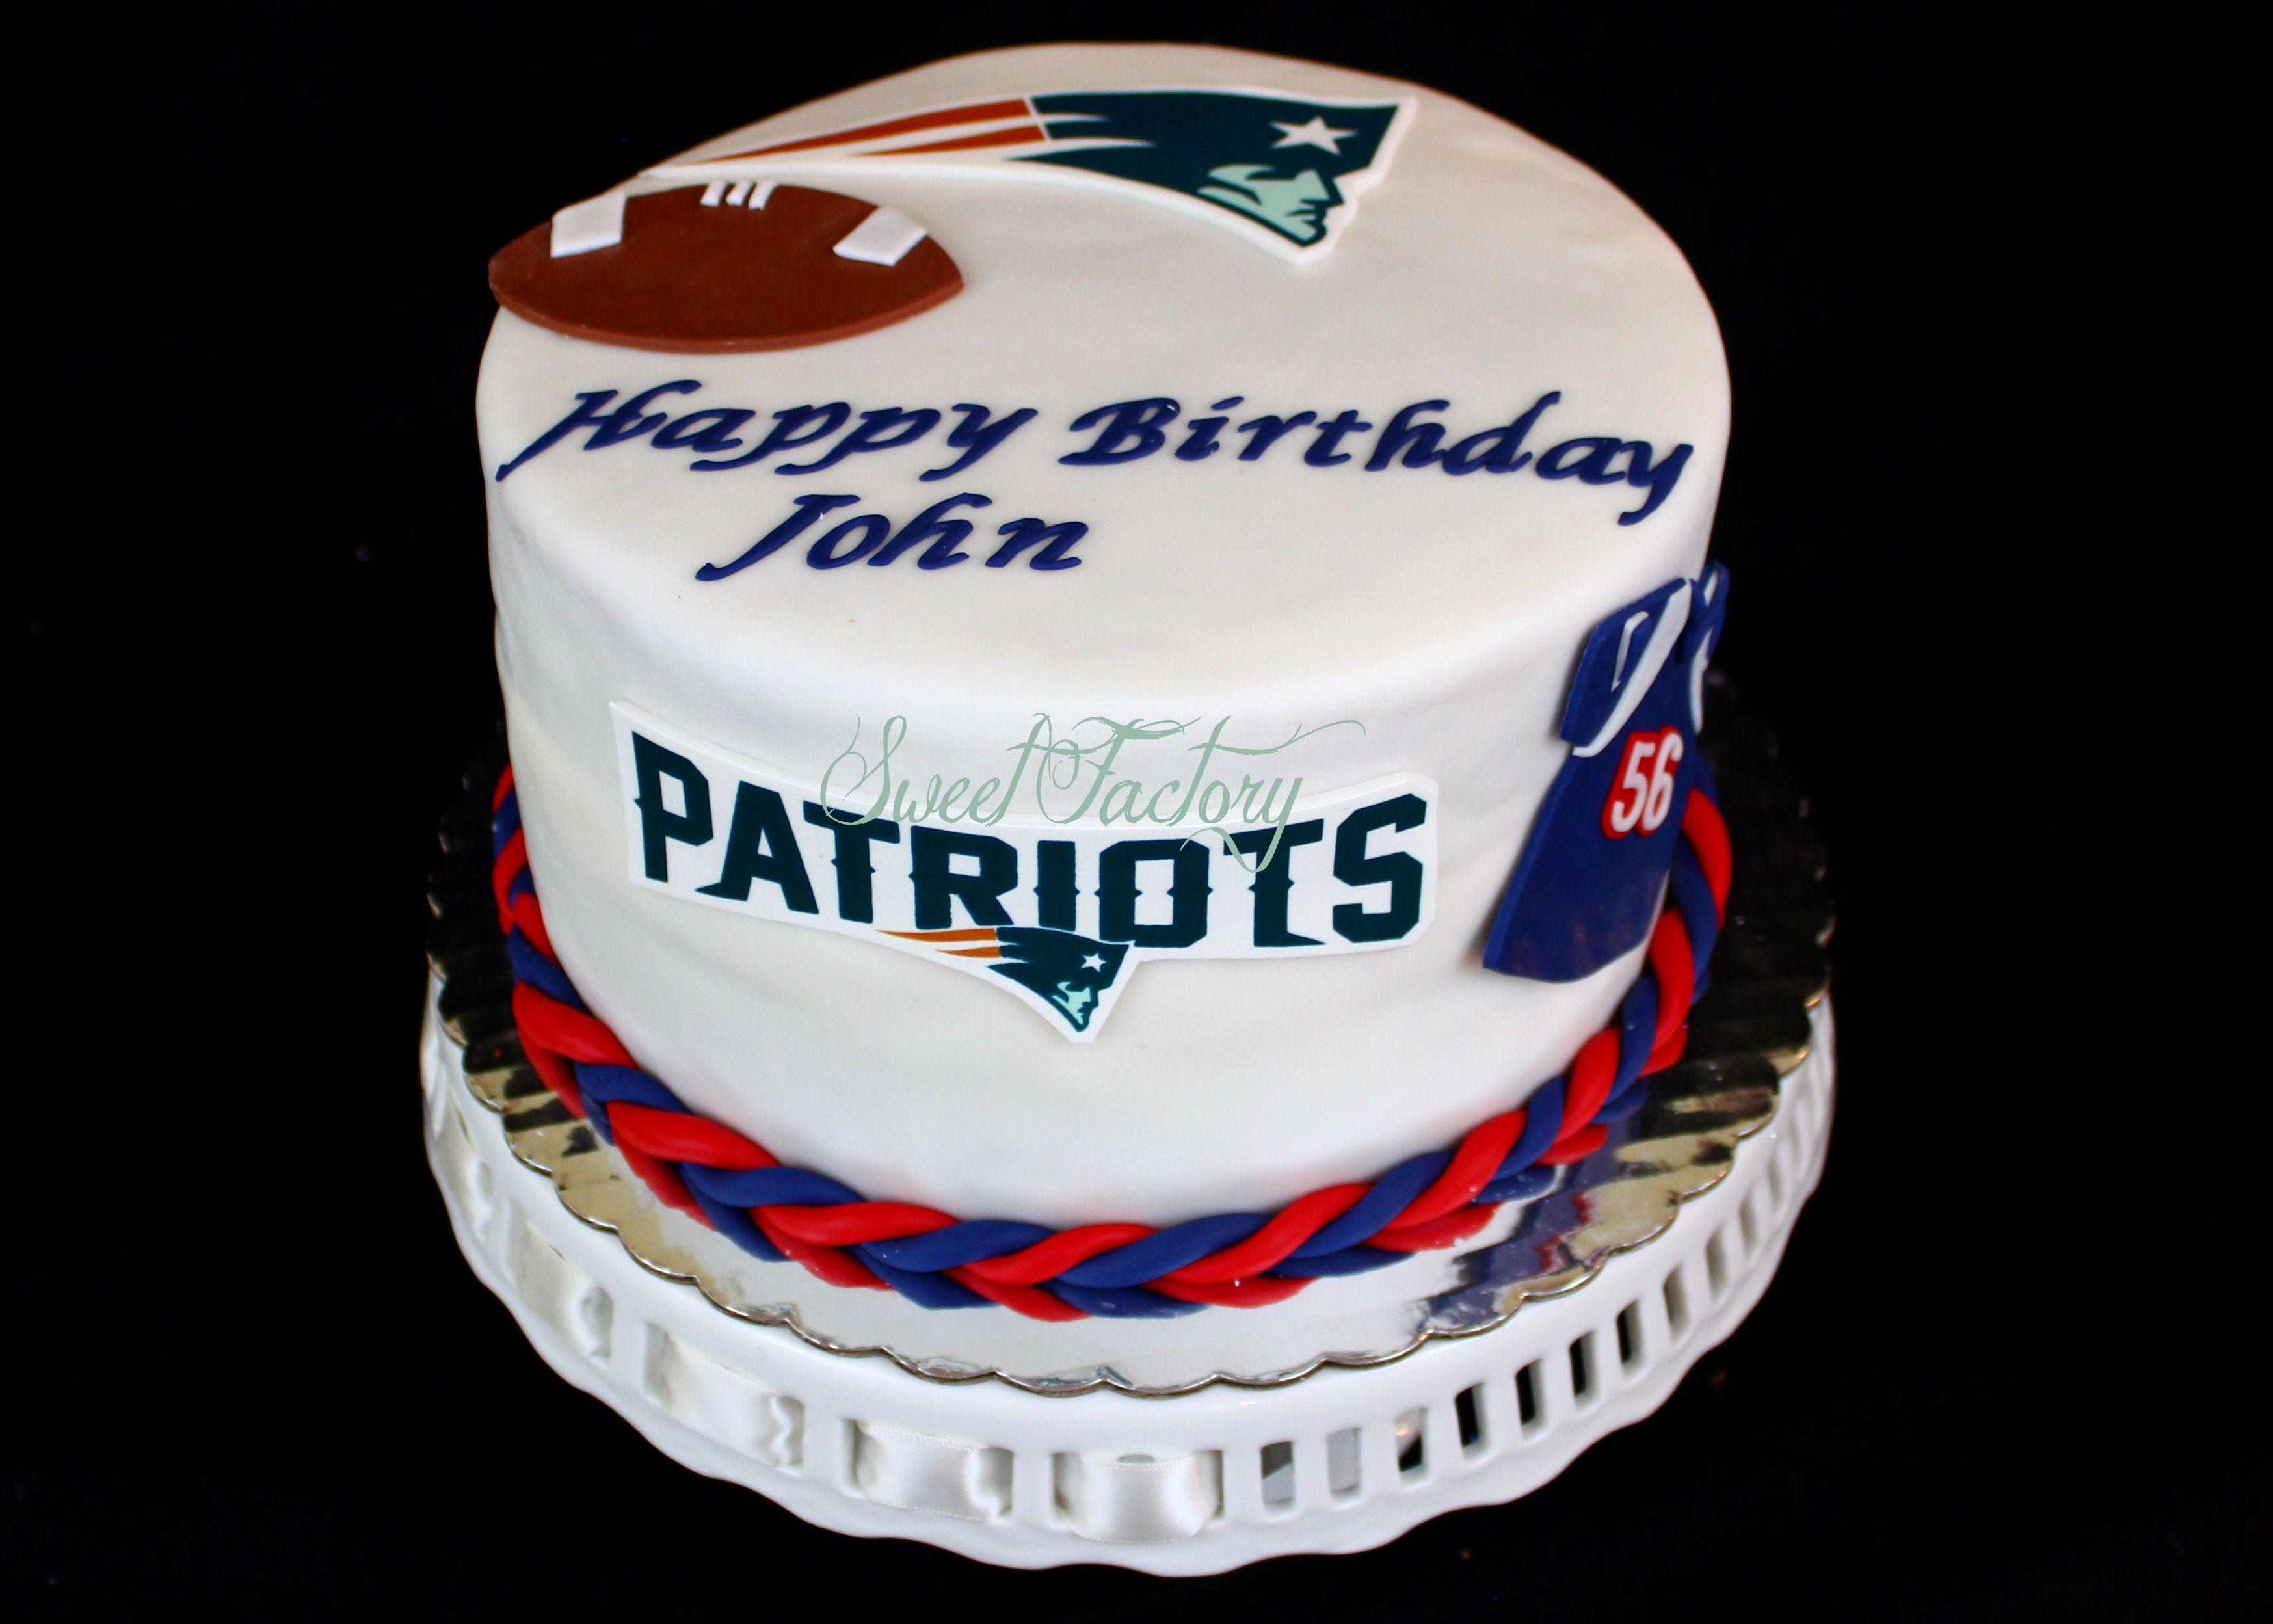 Patriots Cake Nfl Cake Patriotic Cake 16 Birthday Cake Nfl Cake